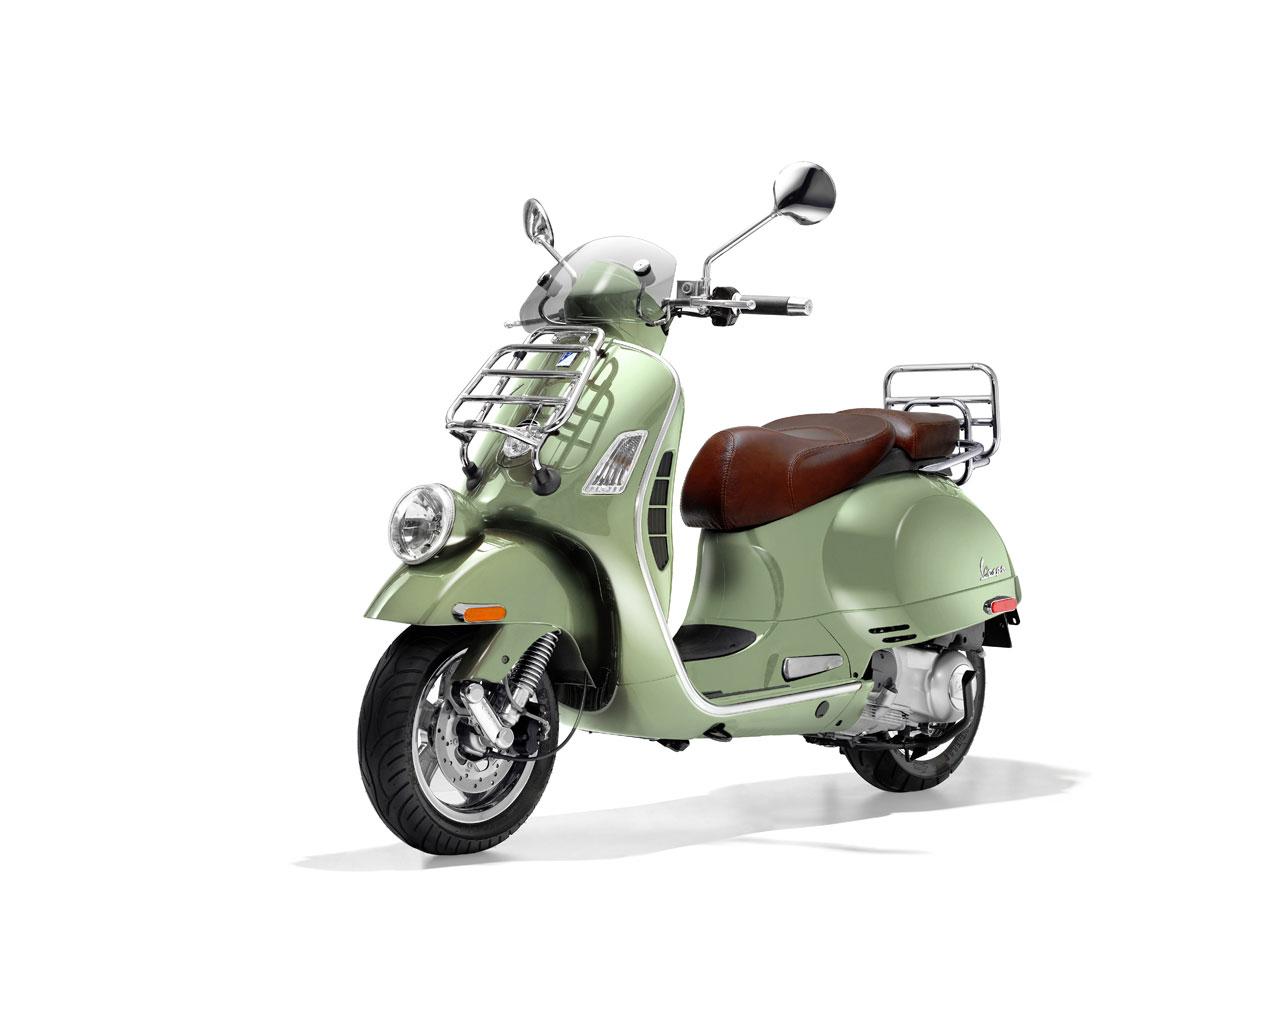 Vespa gtv 300 vespa scooters for Max motor dreams cost